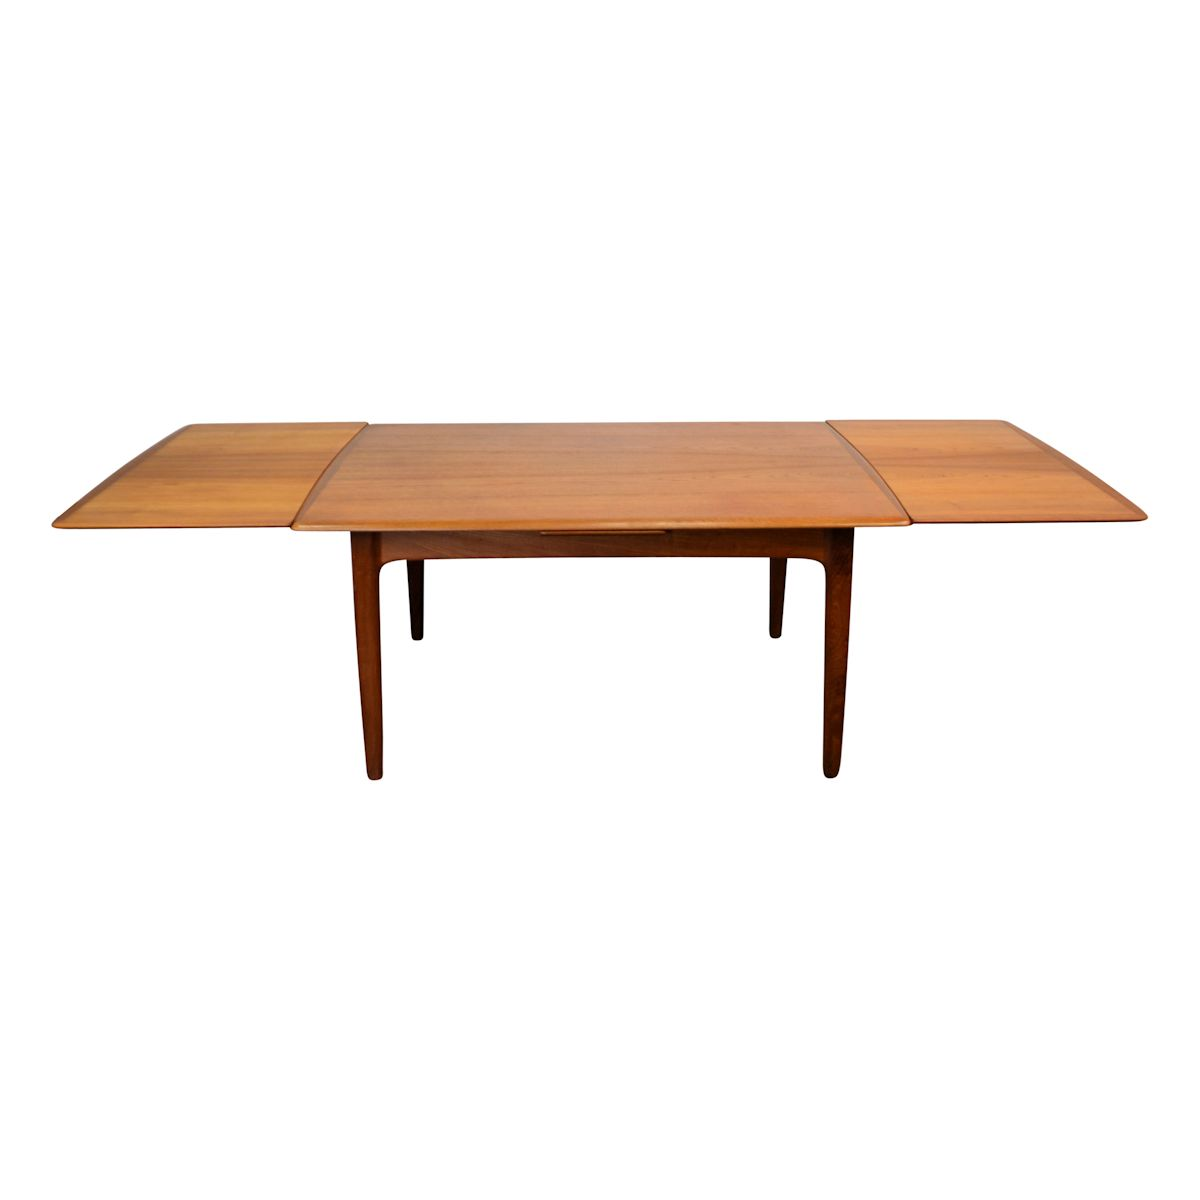 Vintage Danish Modern Svend Aage Madsen Dining Table - extended